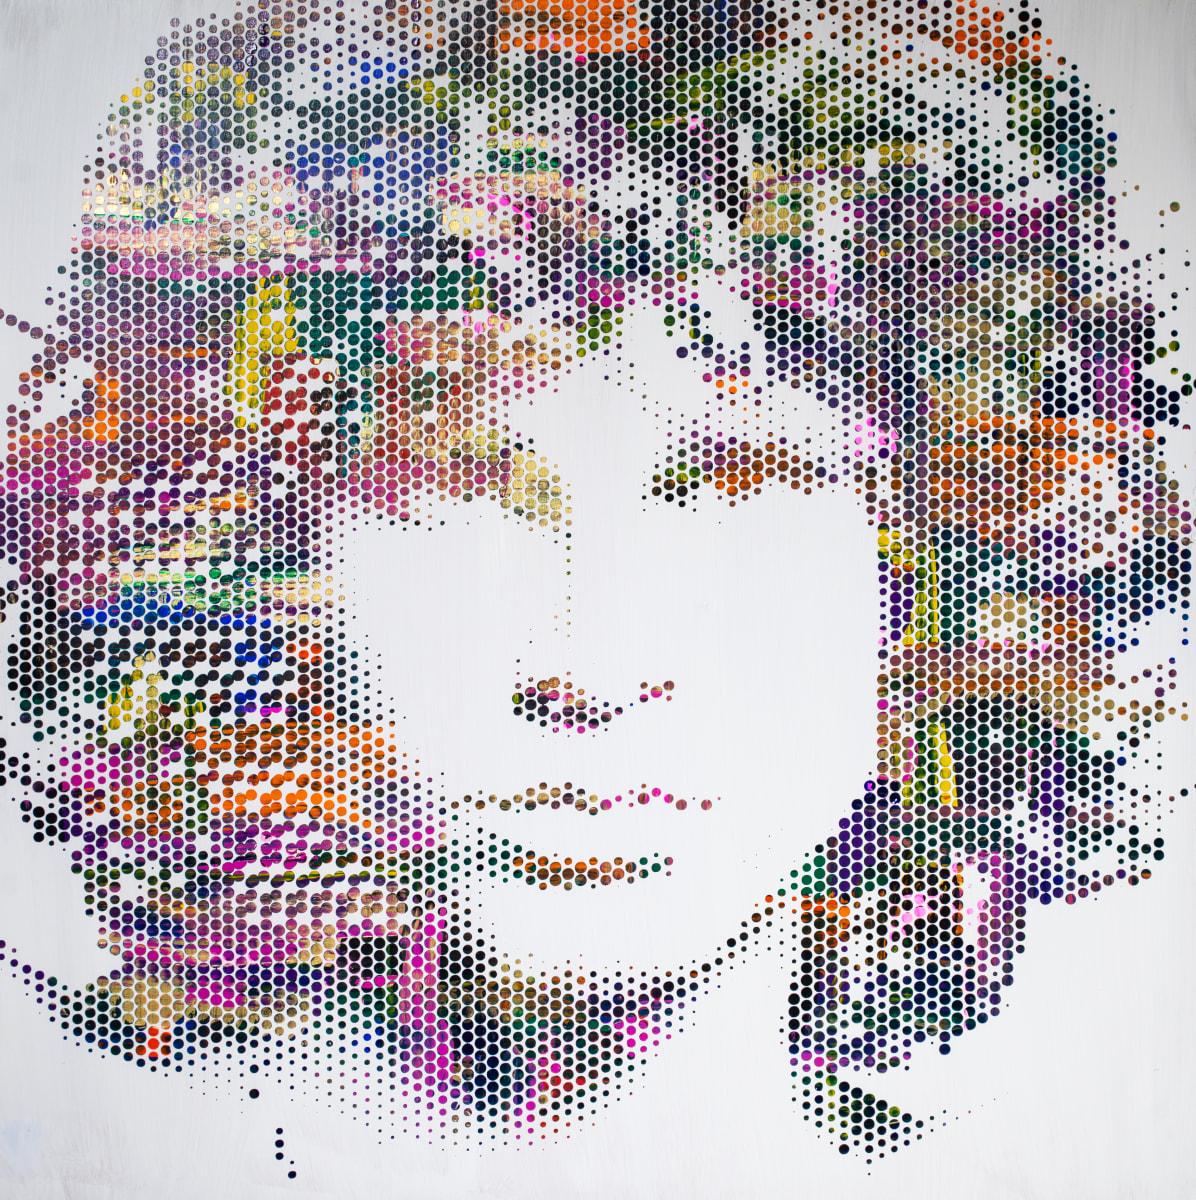 Jim Morrison II by Sean Christopher Ward